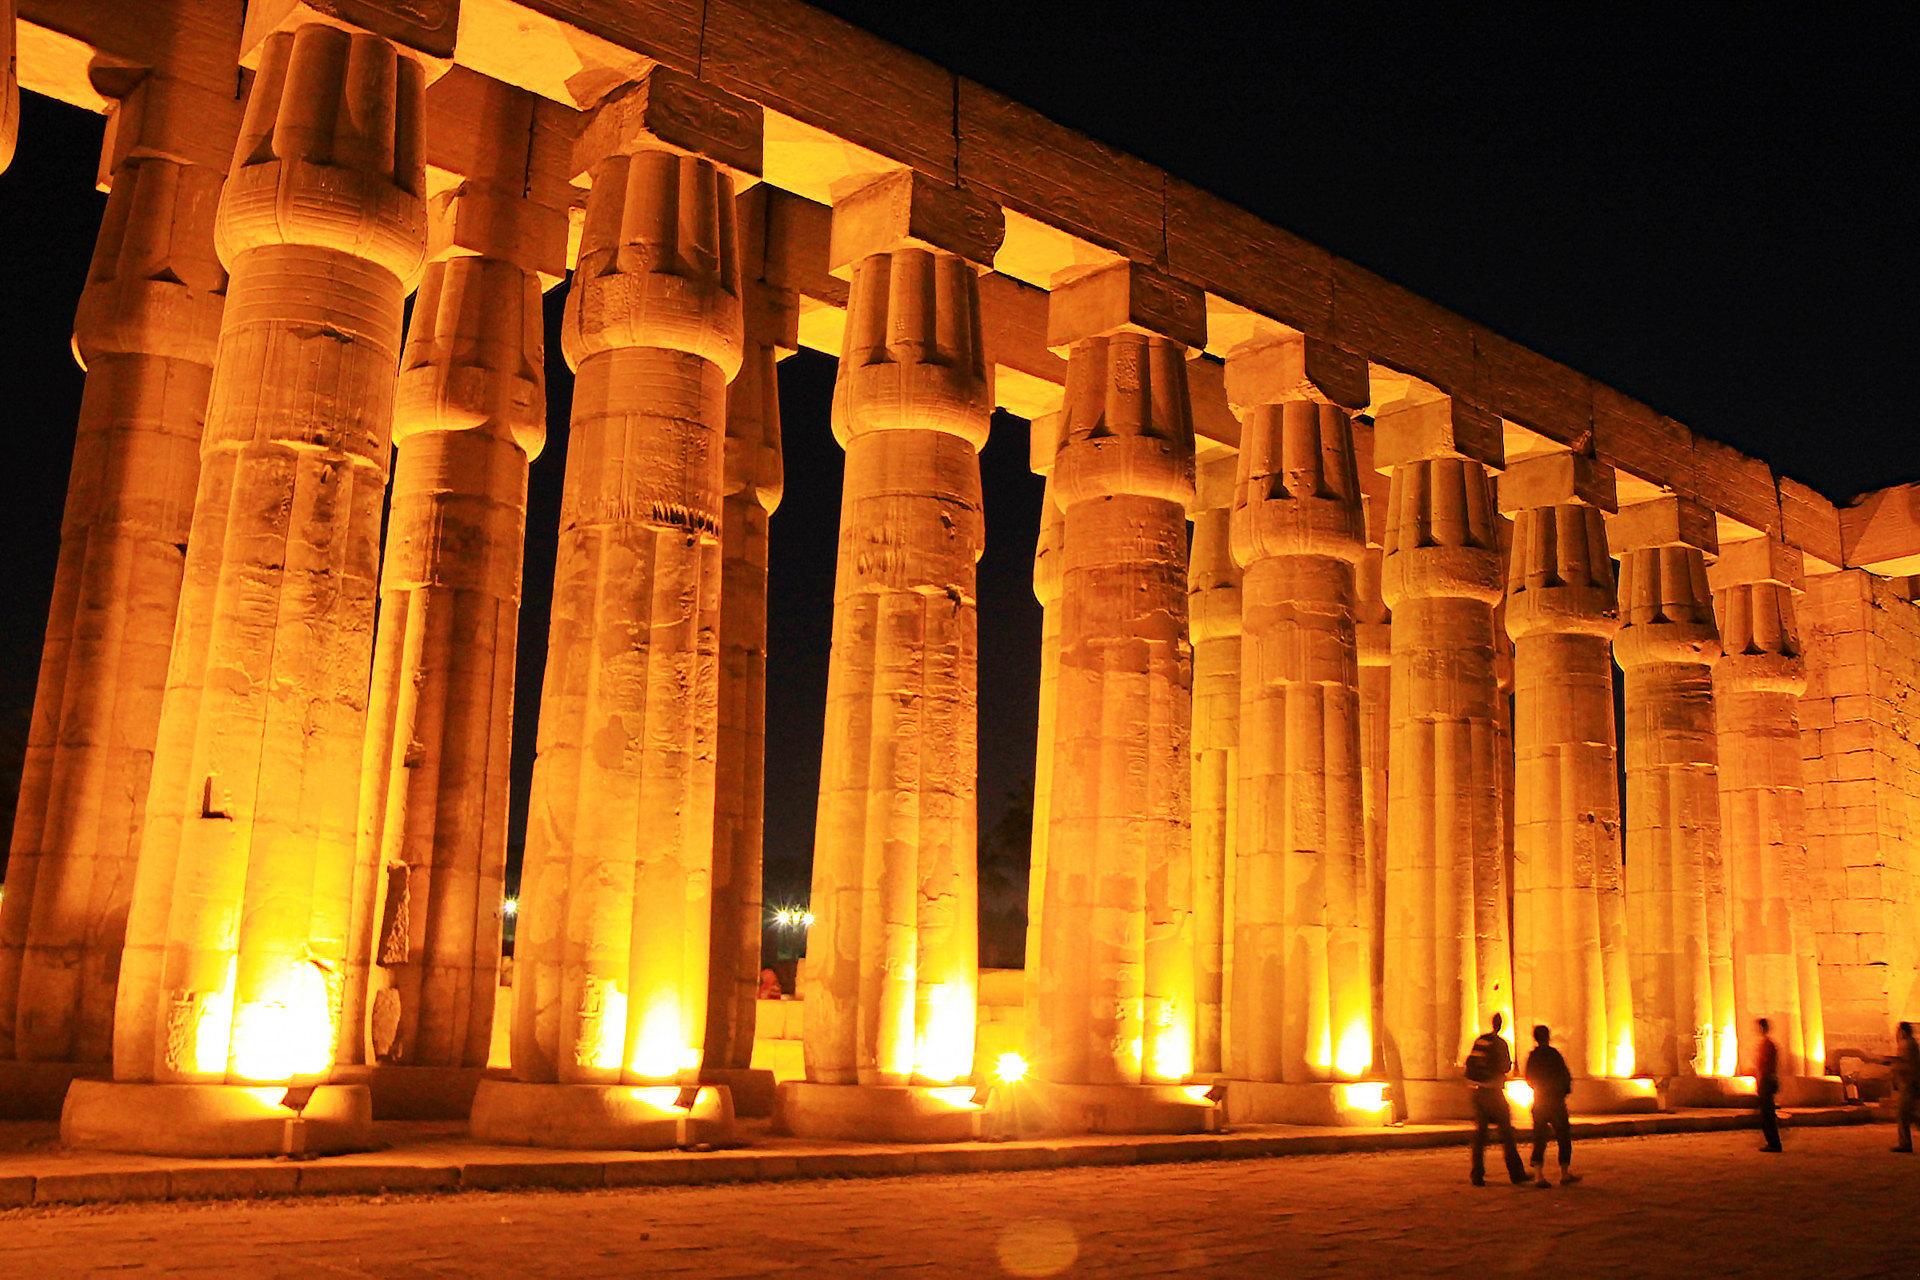 阿蒙神庙  Amun Temple of Karnak   -2